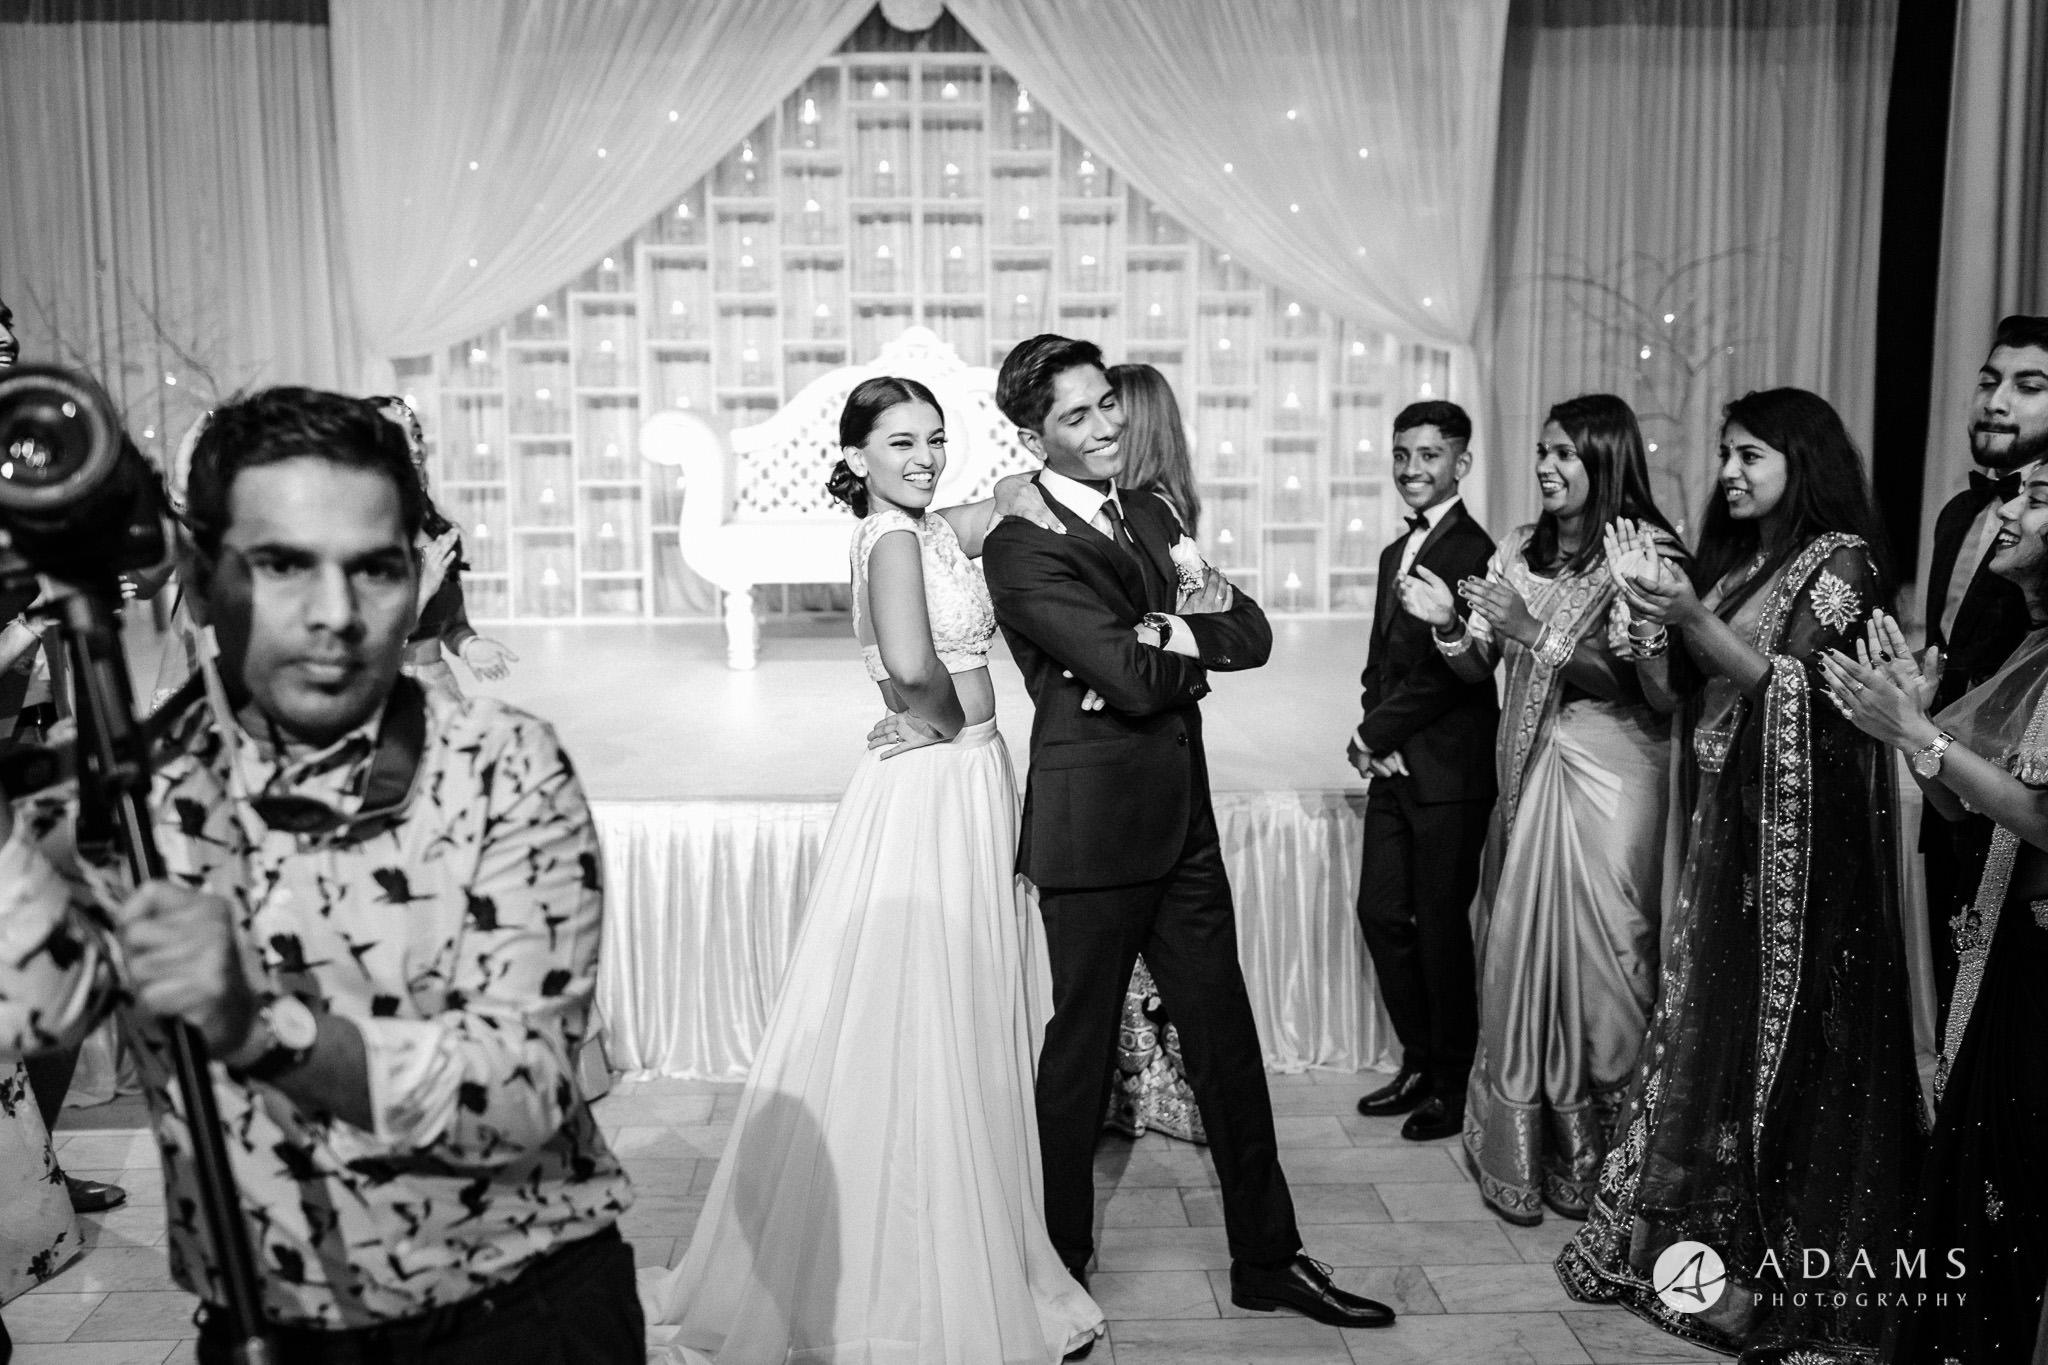 Norway Tamil Wedding couple dancing